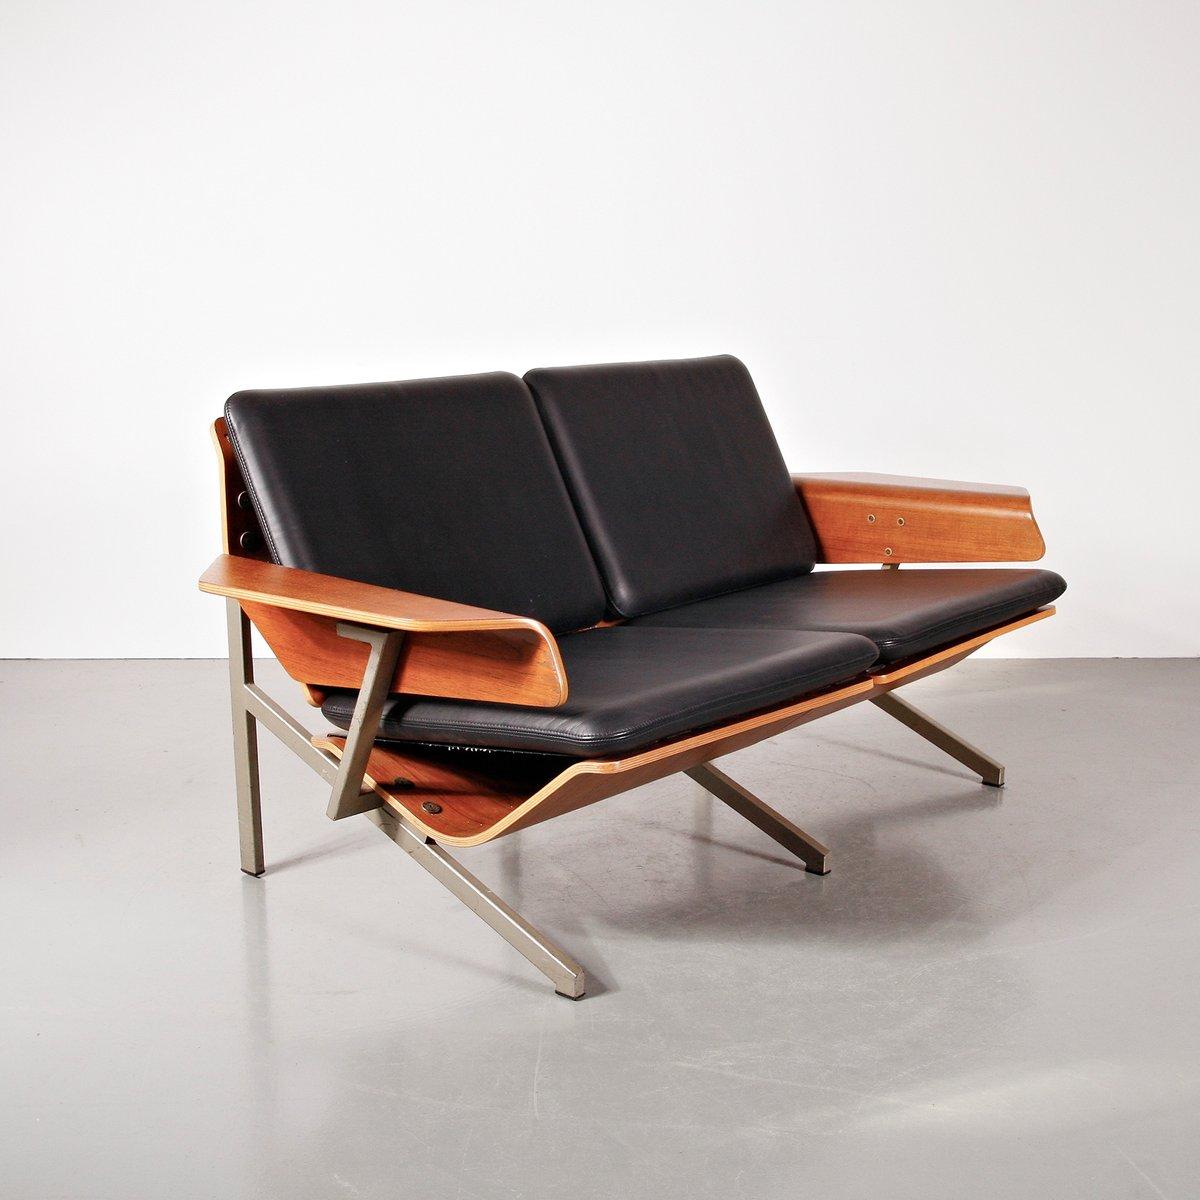 2 Seater Leather Sofa by Cornelis Zitman 1964 for sale at  : 2 seater leather sofa by cornelis zitman 1964 from www.pamono.co.uk size 1200 x 1200 jpeg 70kB